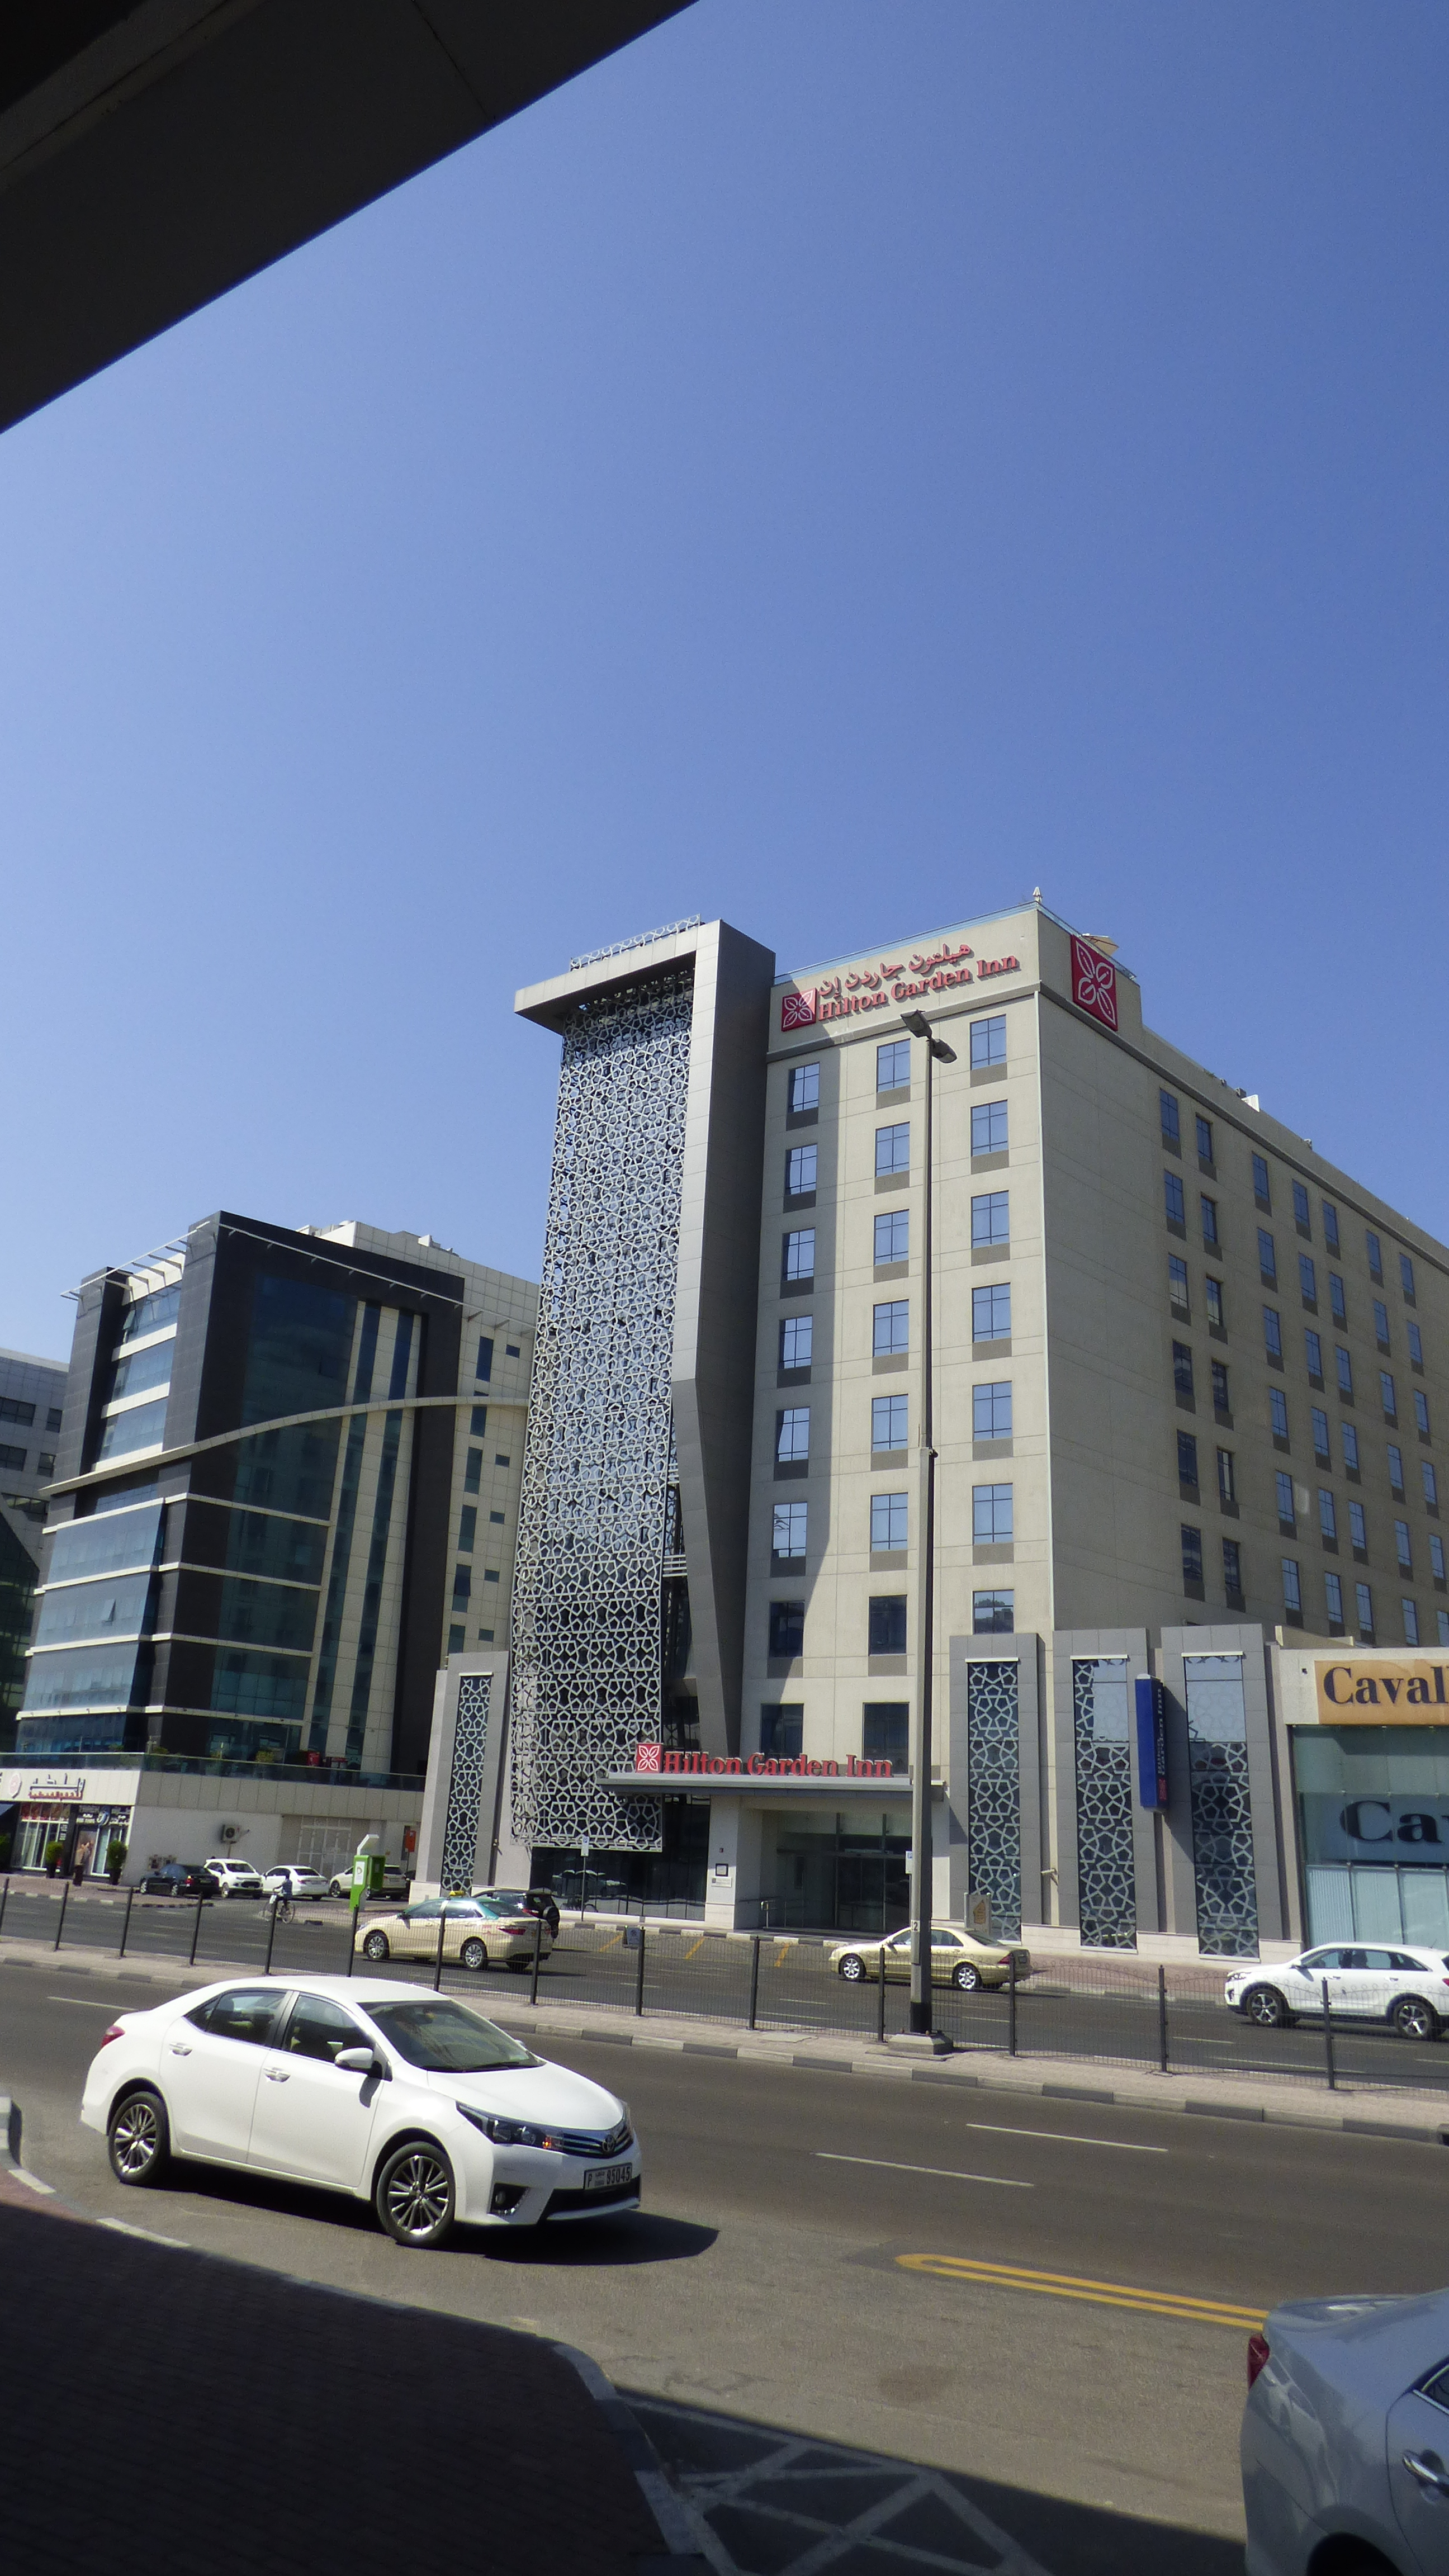 Hilton garden inn dubai al muraqabat ic2 - Hilton garden inn dubai al muraqabat ...